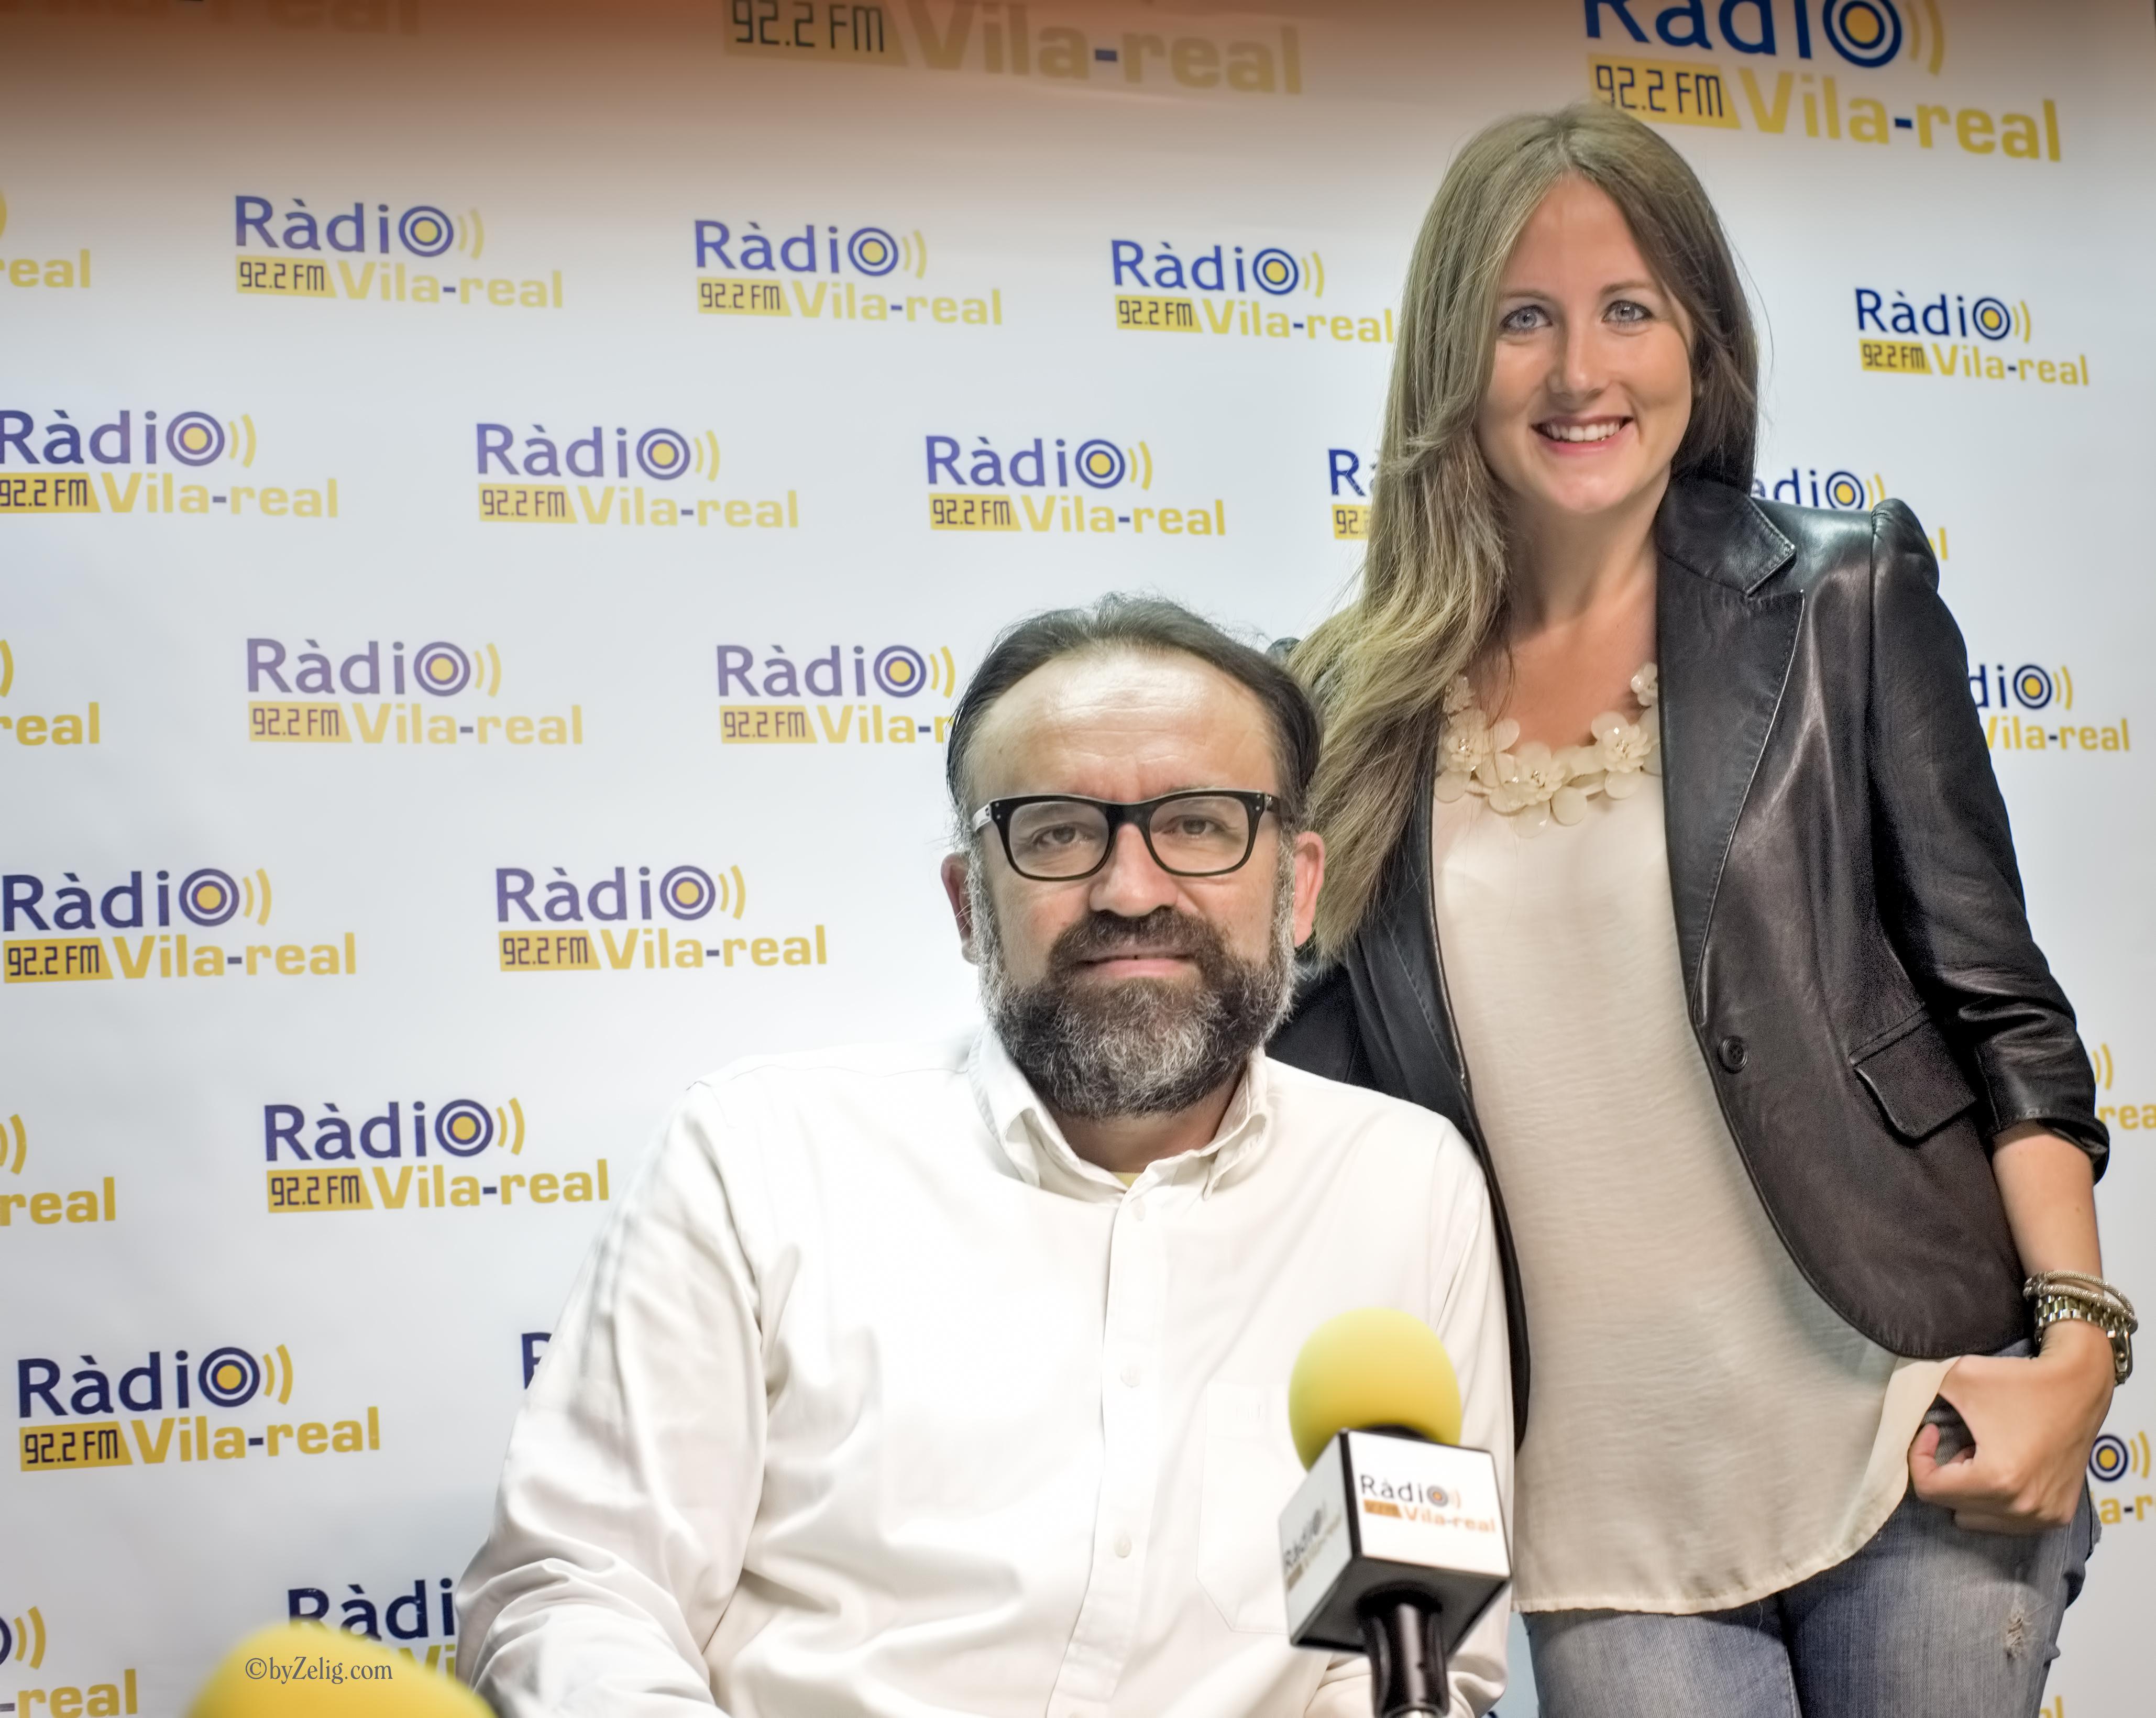 Esports Radio Vila-real. Programa del 20 de octubre 2017